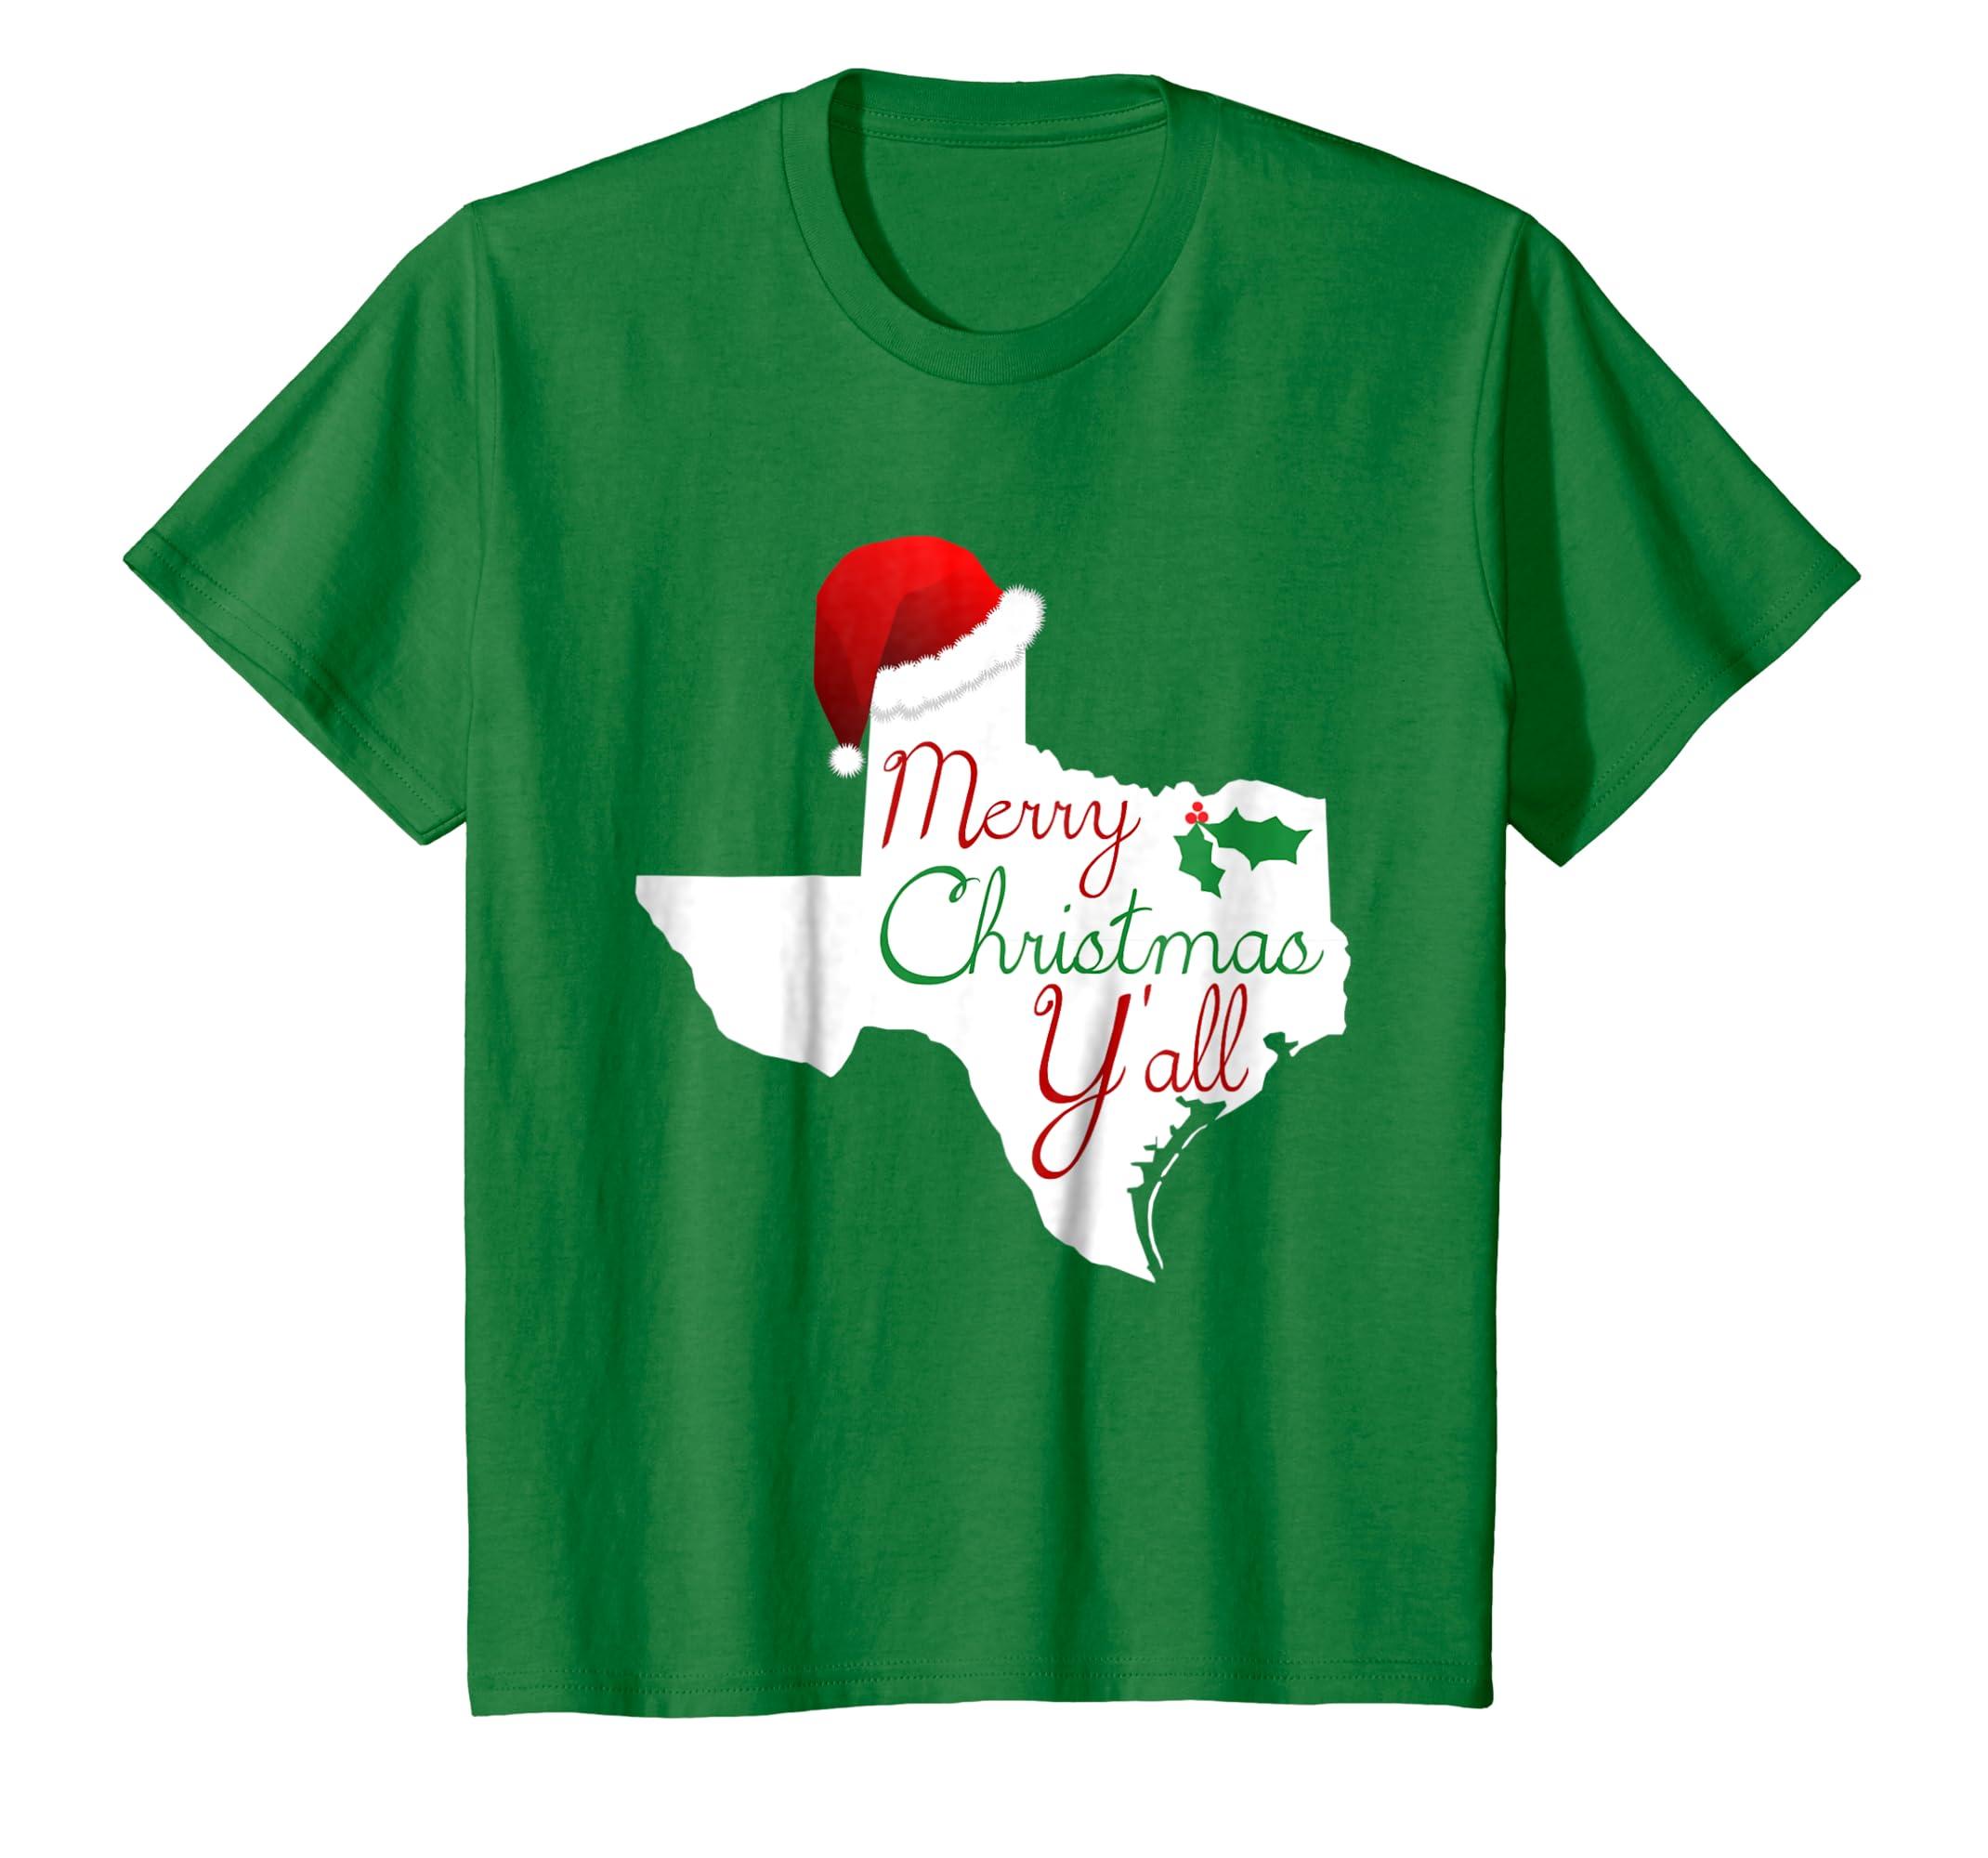 d2e9e5a7a6eb Amazon.com: Texas Christmas Shirt - Merry Christmas Y'all Texas XMas Tee:  Clothing